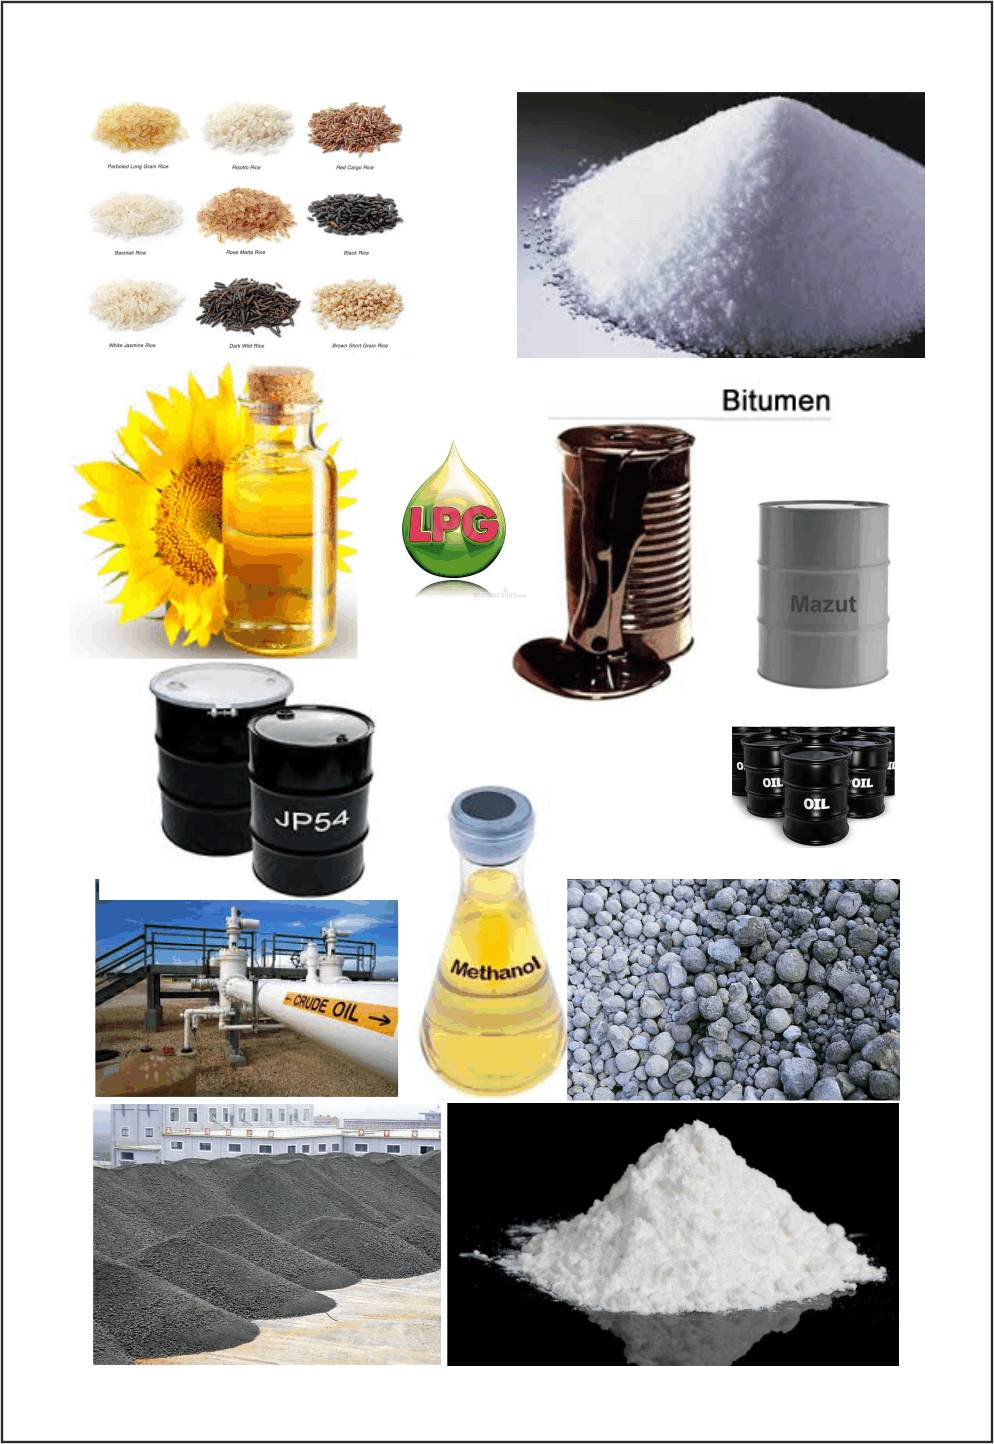 Crude Oil, PropaneButane, Methanol,Bitumen,Mazut,D2,JP 54 etc. and Minerals such as Lime stone,Gypsu